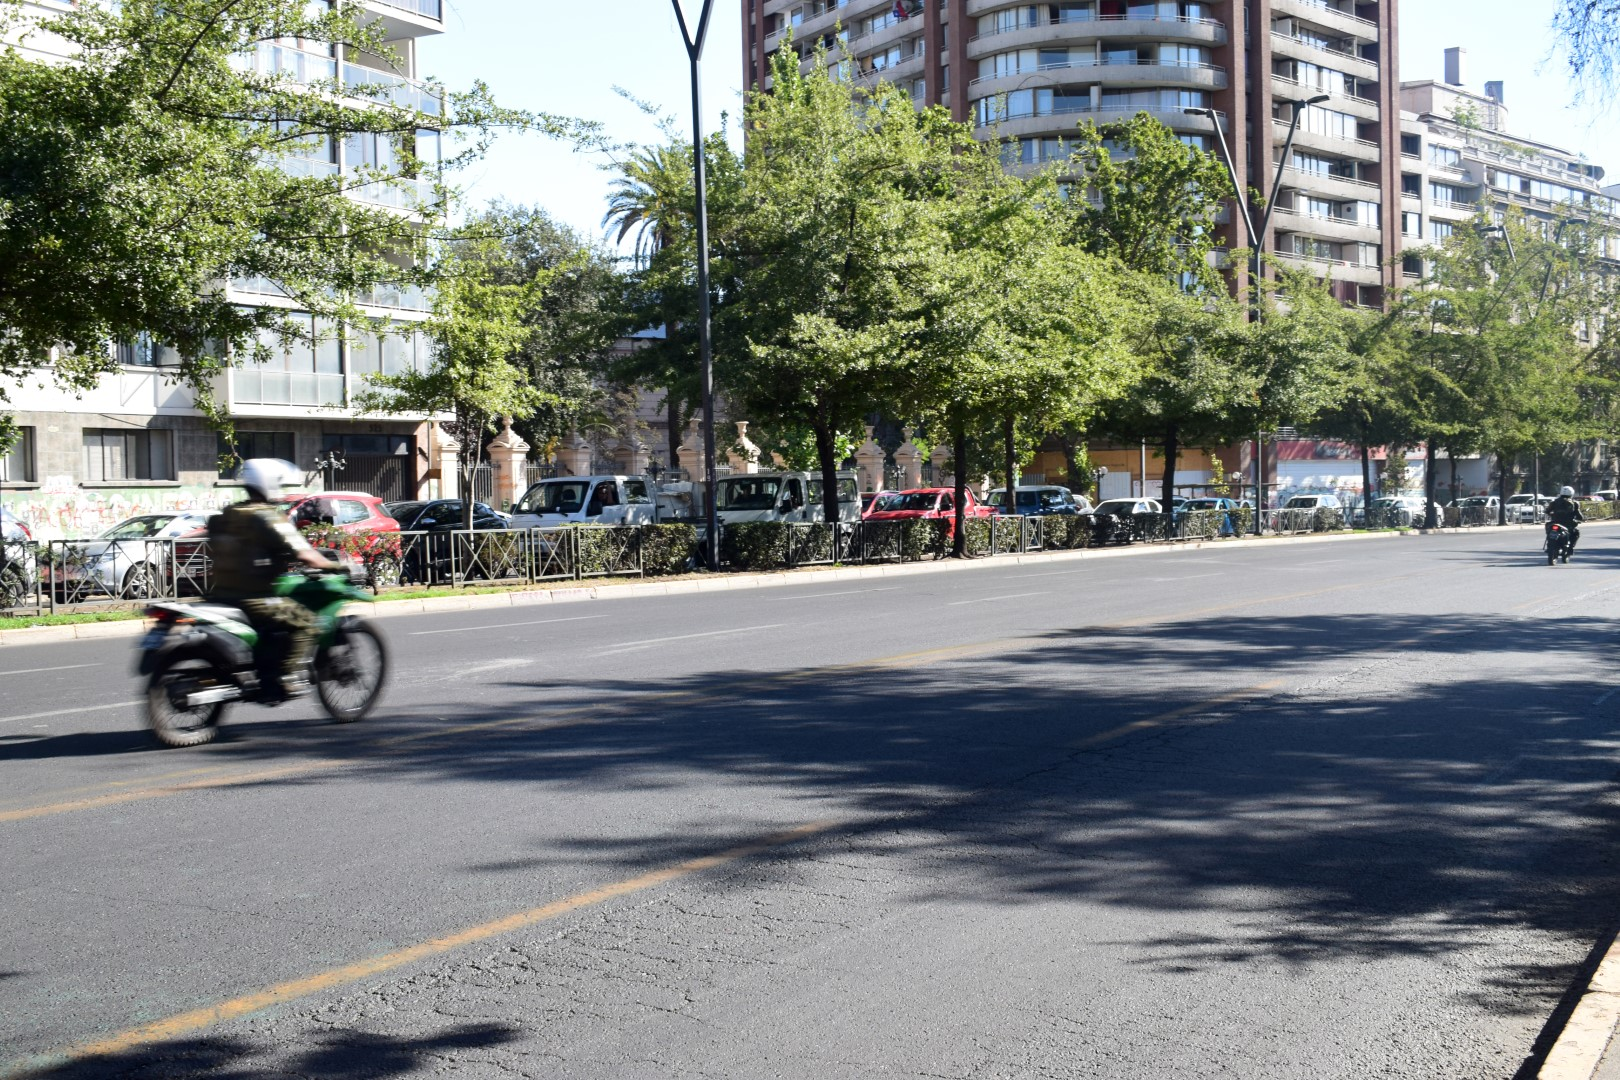 Military police speeding down Avenida Providencia, Santiago